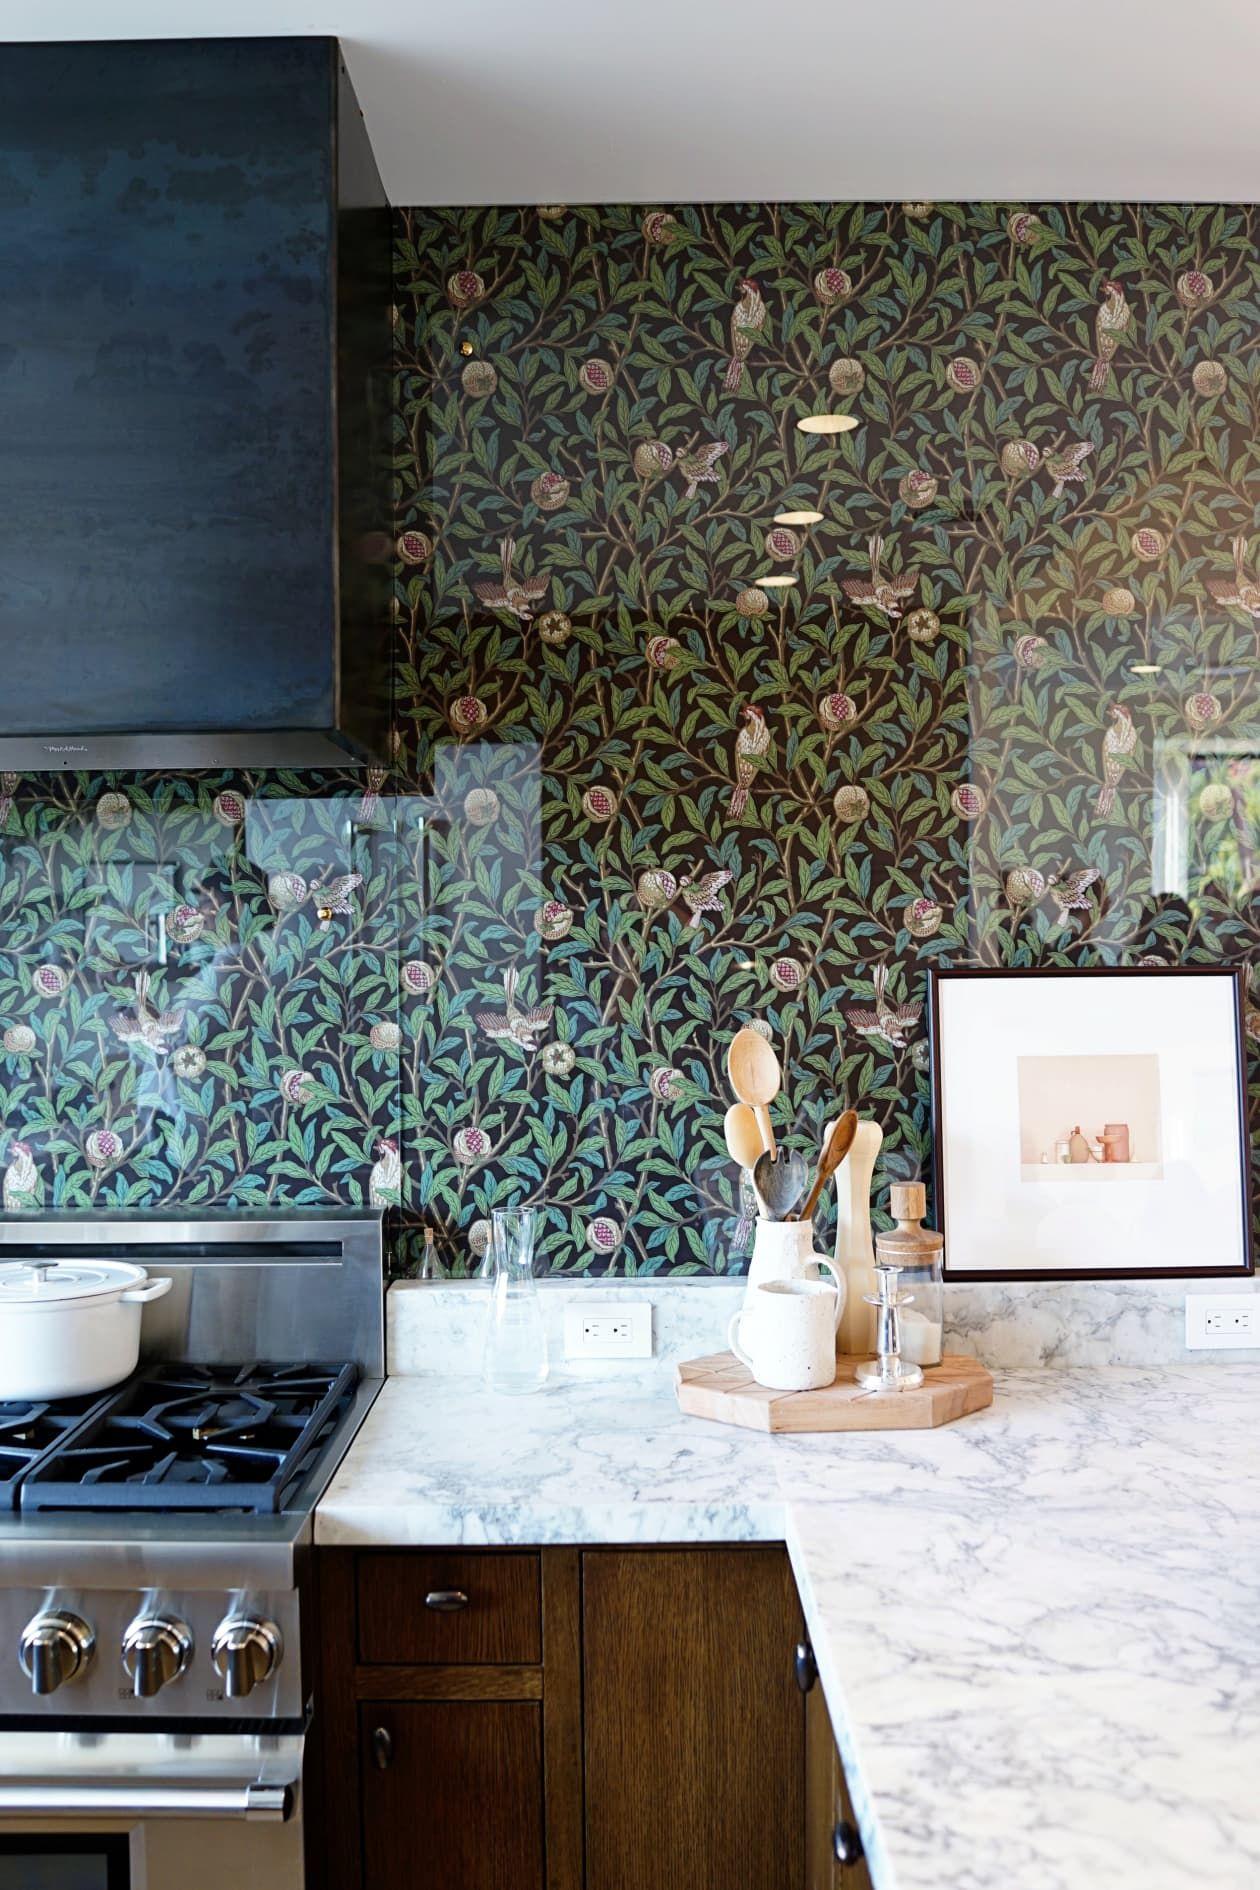 - 11 Intriguing Kitchen Backsplash Ideas You've Never Thought Of